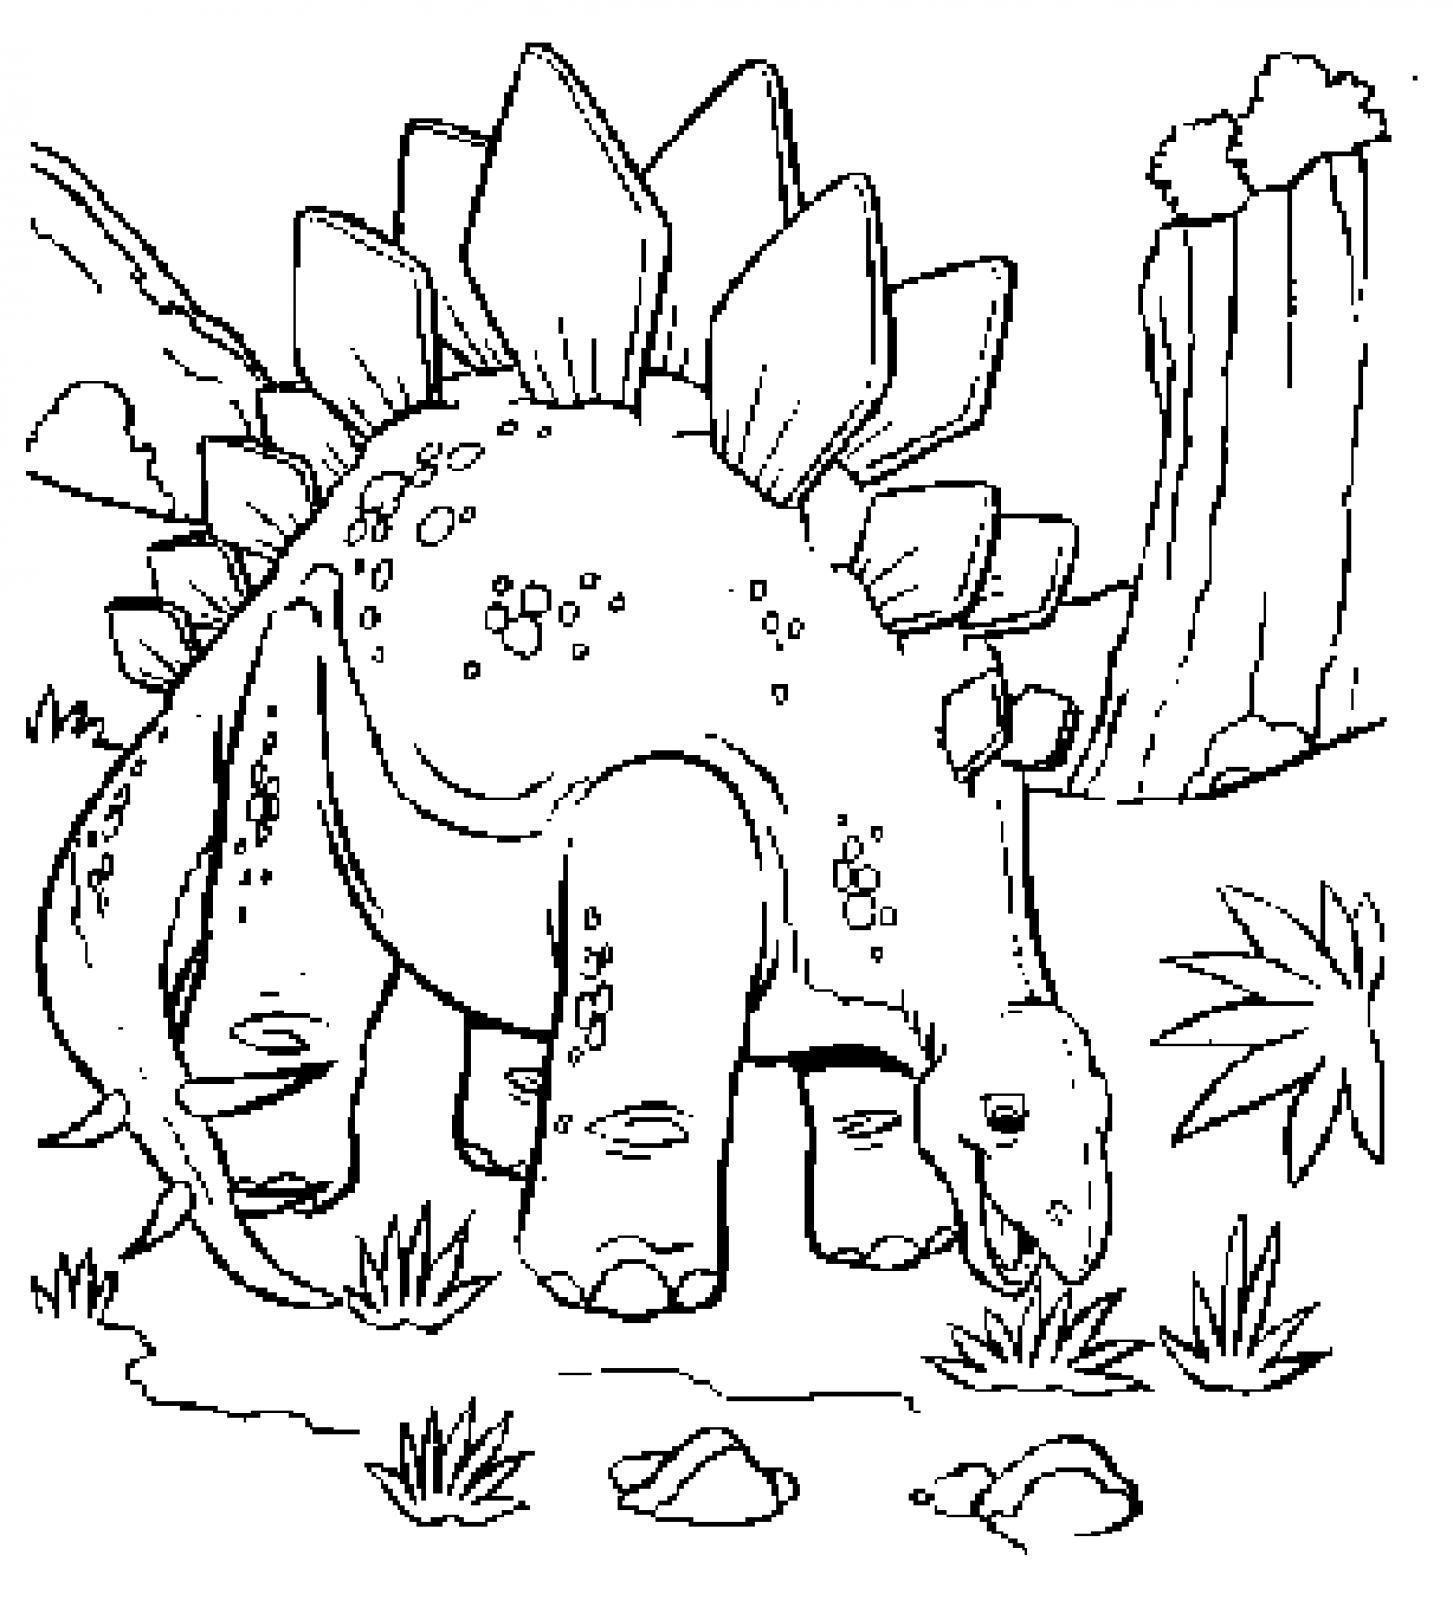 Jurassic Park Coloring Pages Coloringsuite Collection Dinosaur Coloring Pages Cute Coloring Pages Dinosaur Coloring